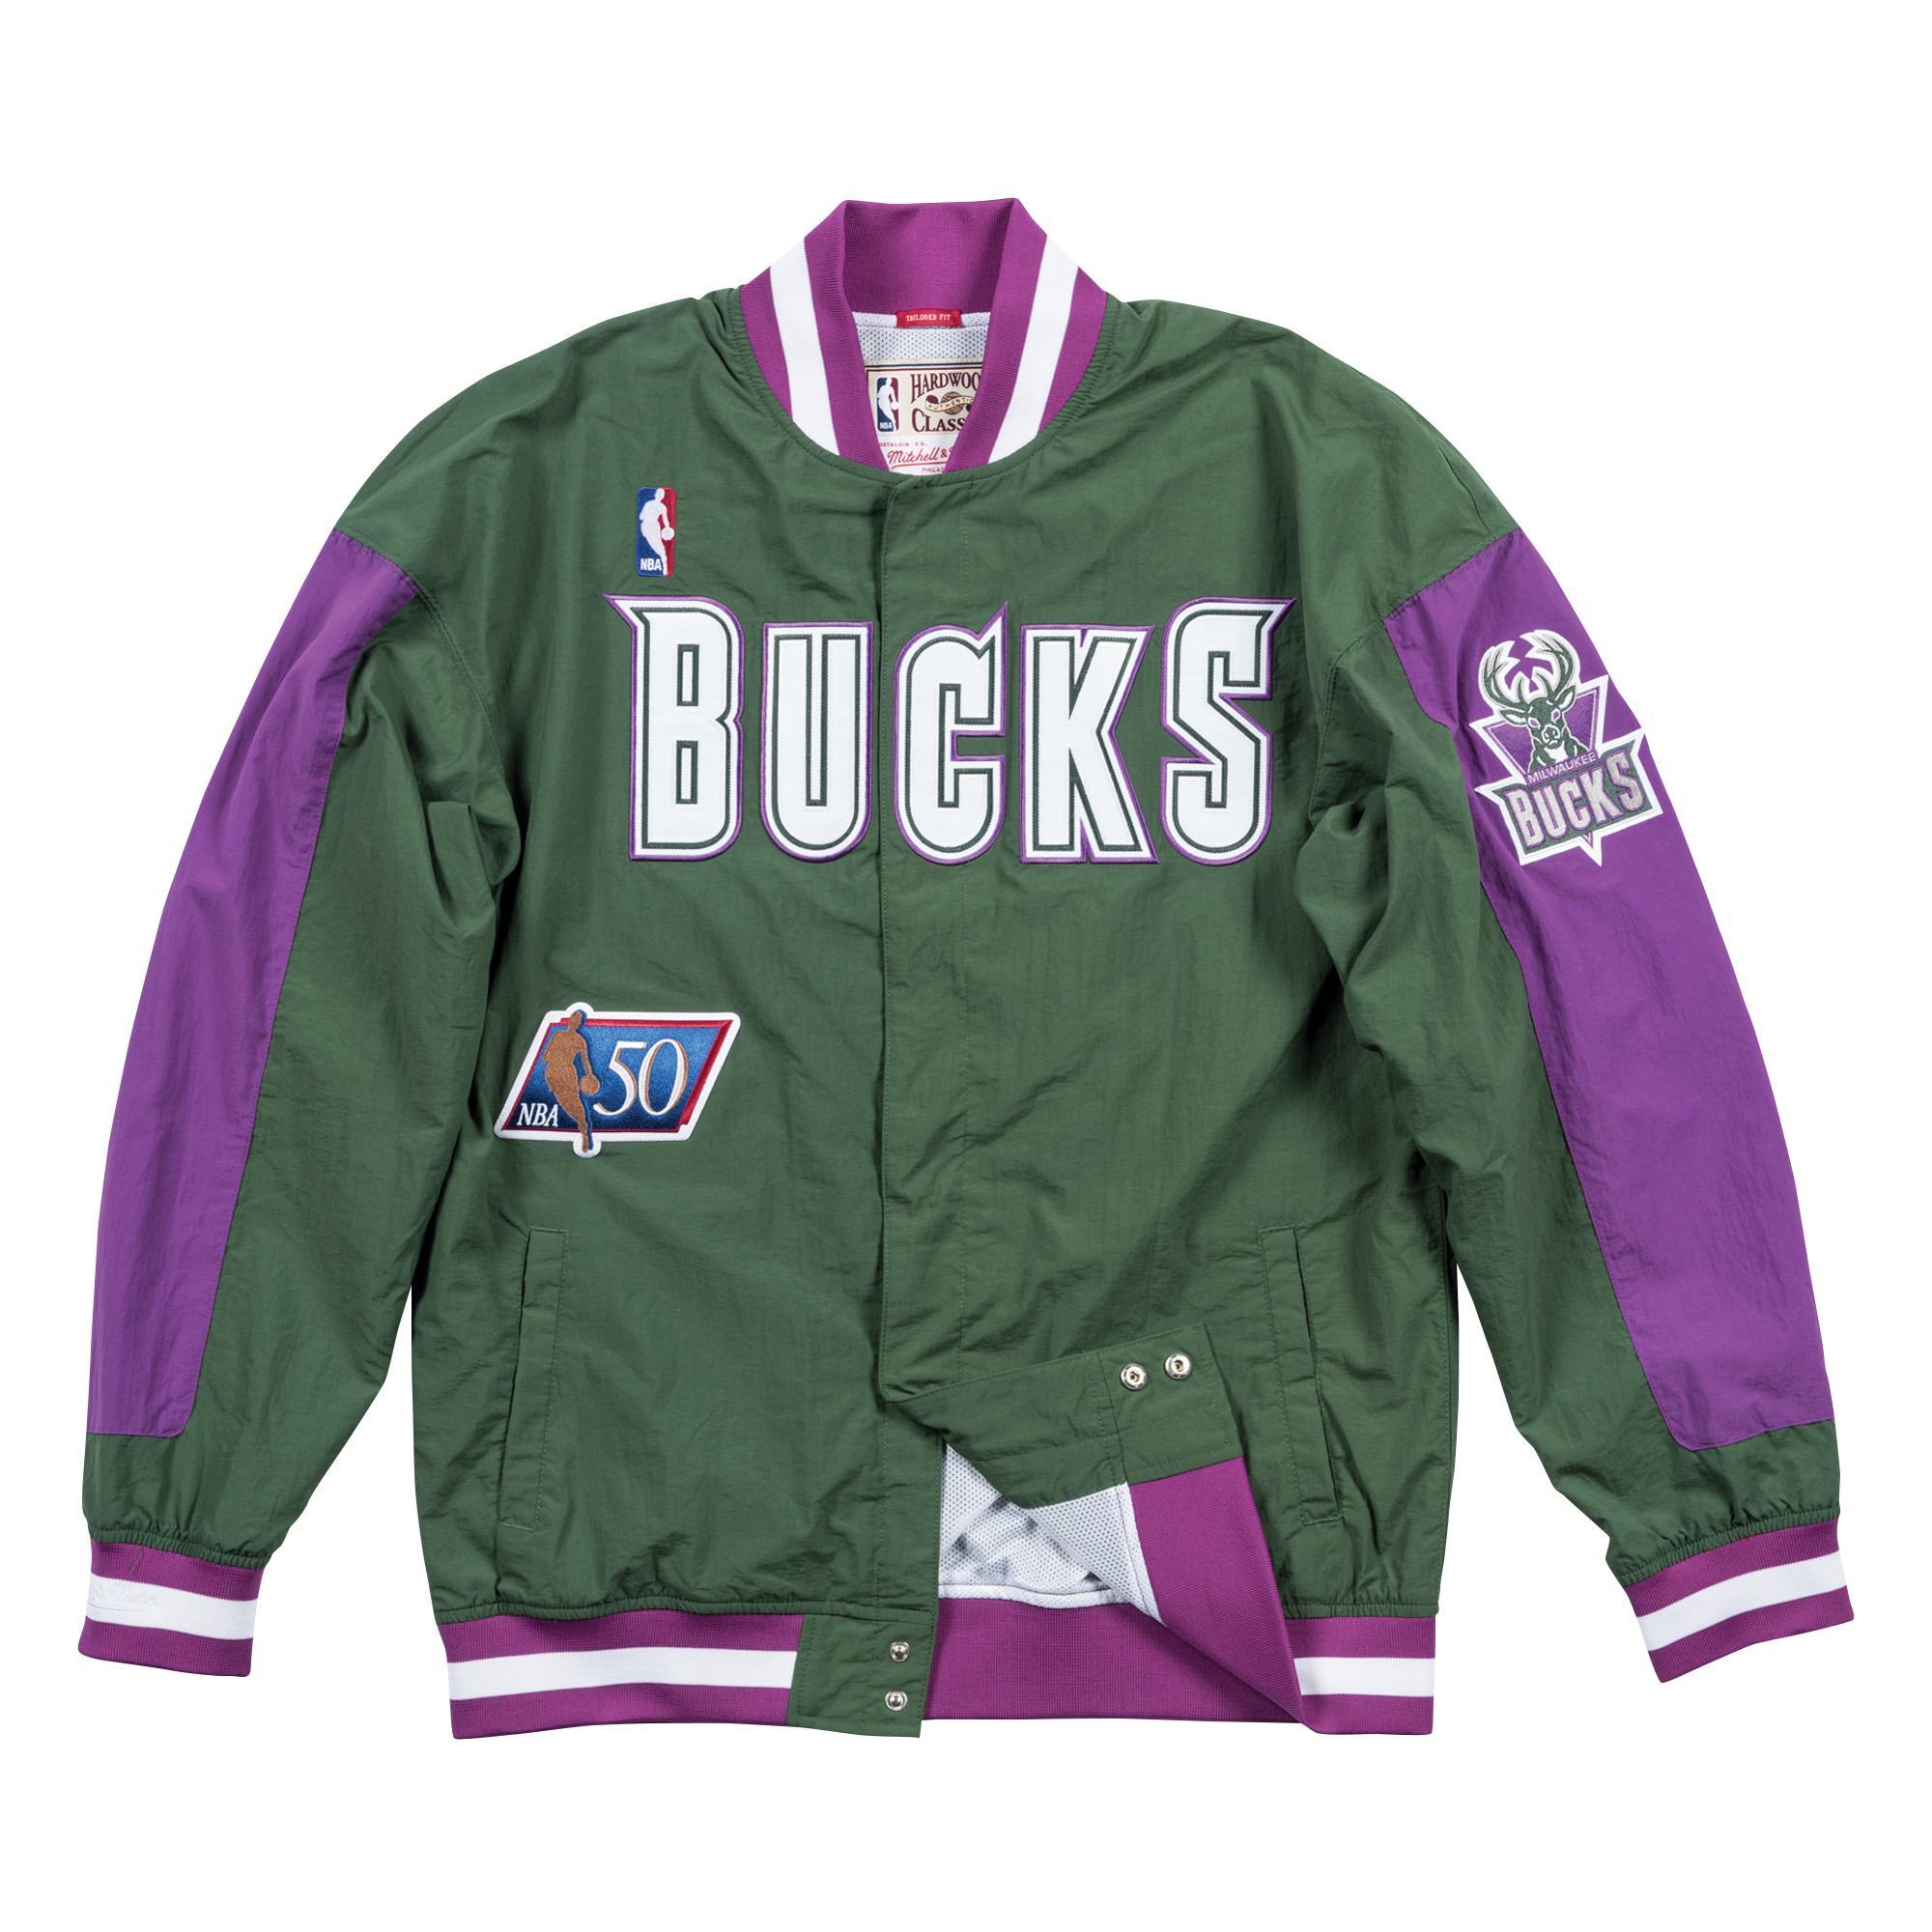 Milwaukee Bucks 1996-97 Authentic Warm